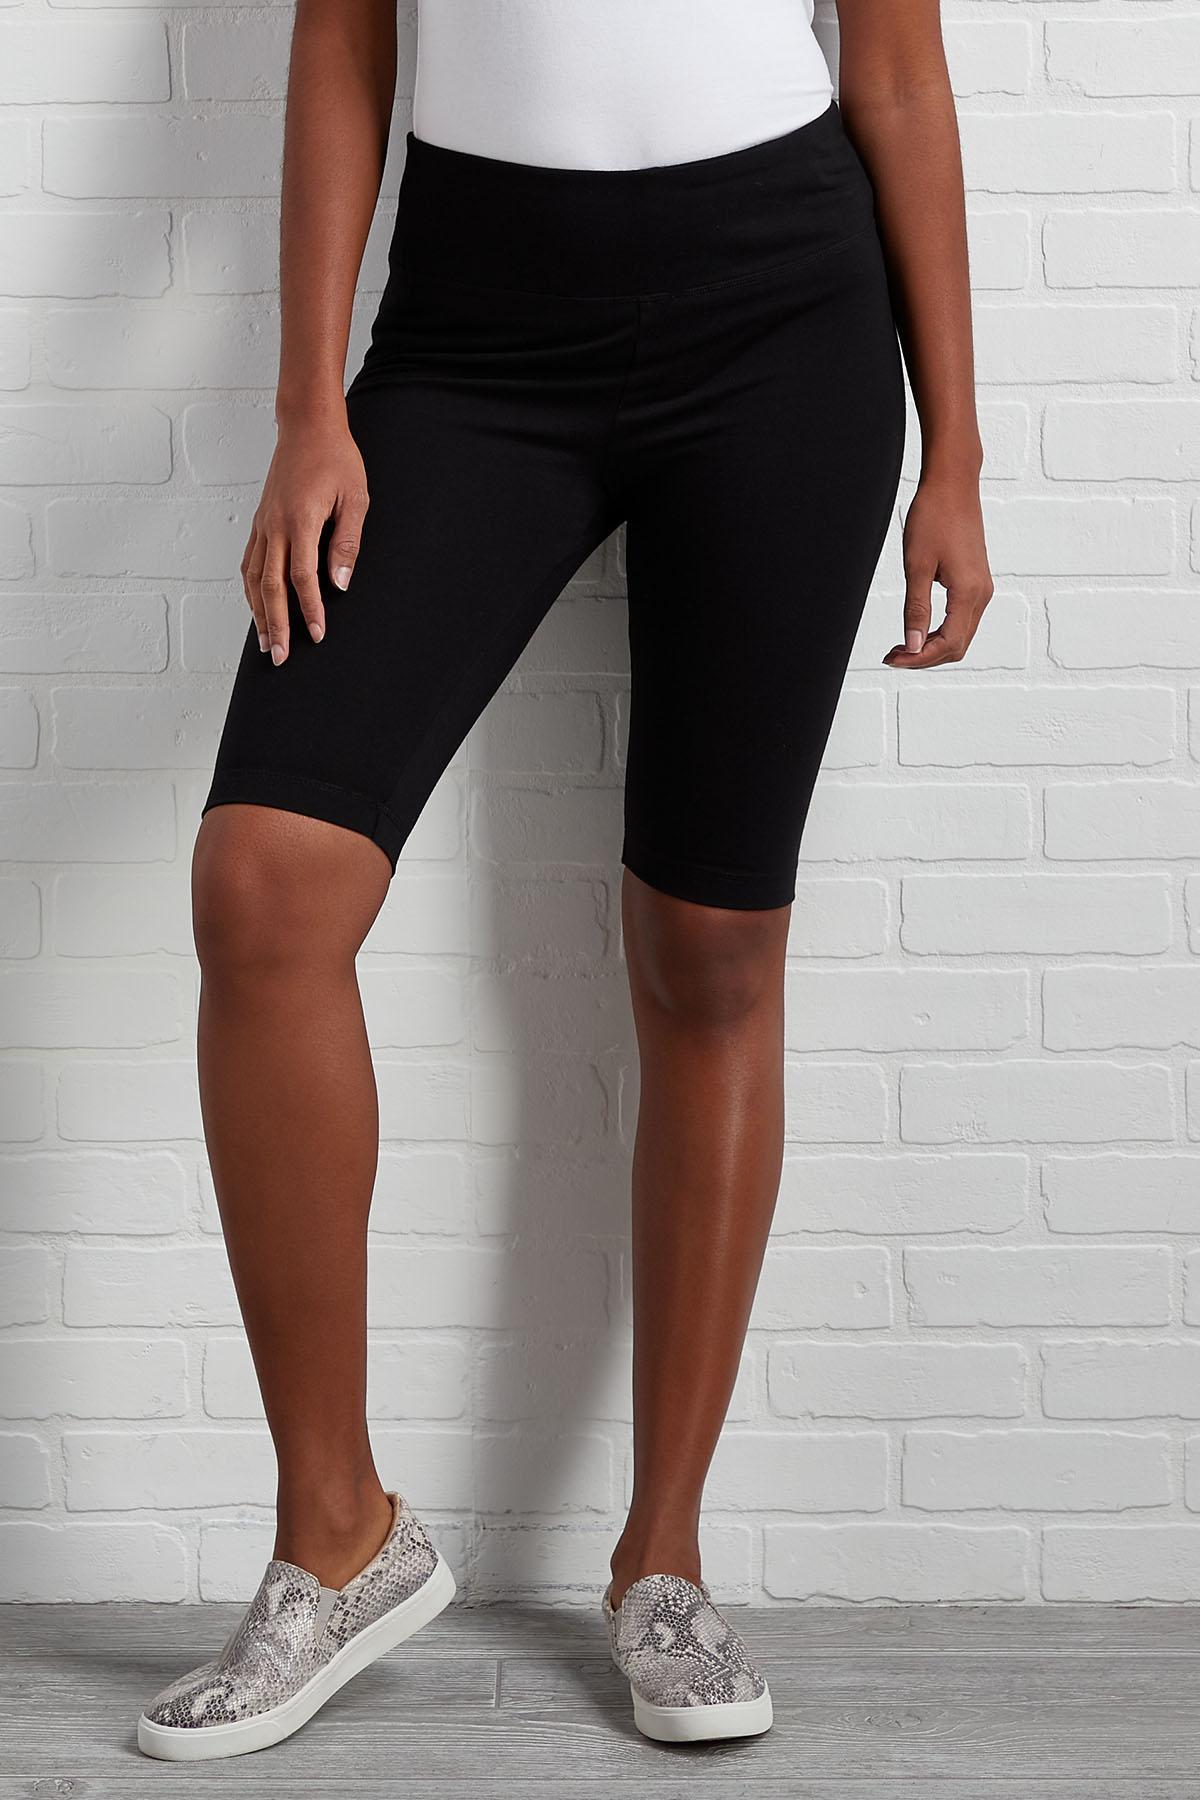 Spinning In Circles Shorts